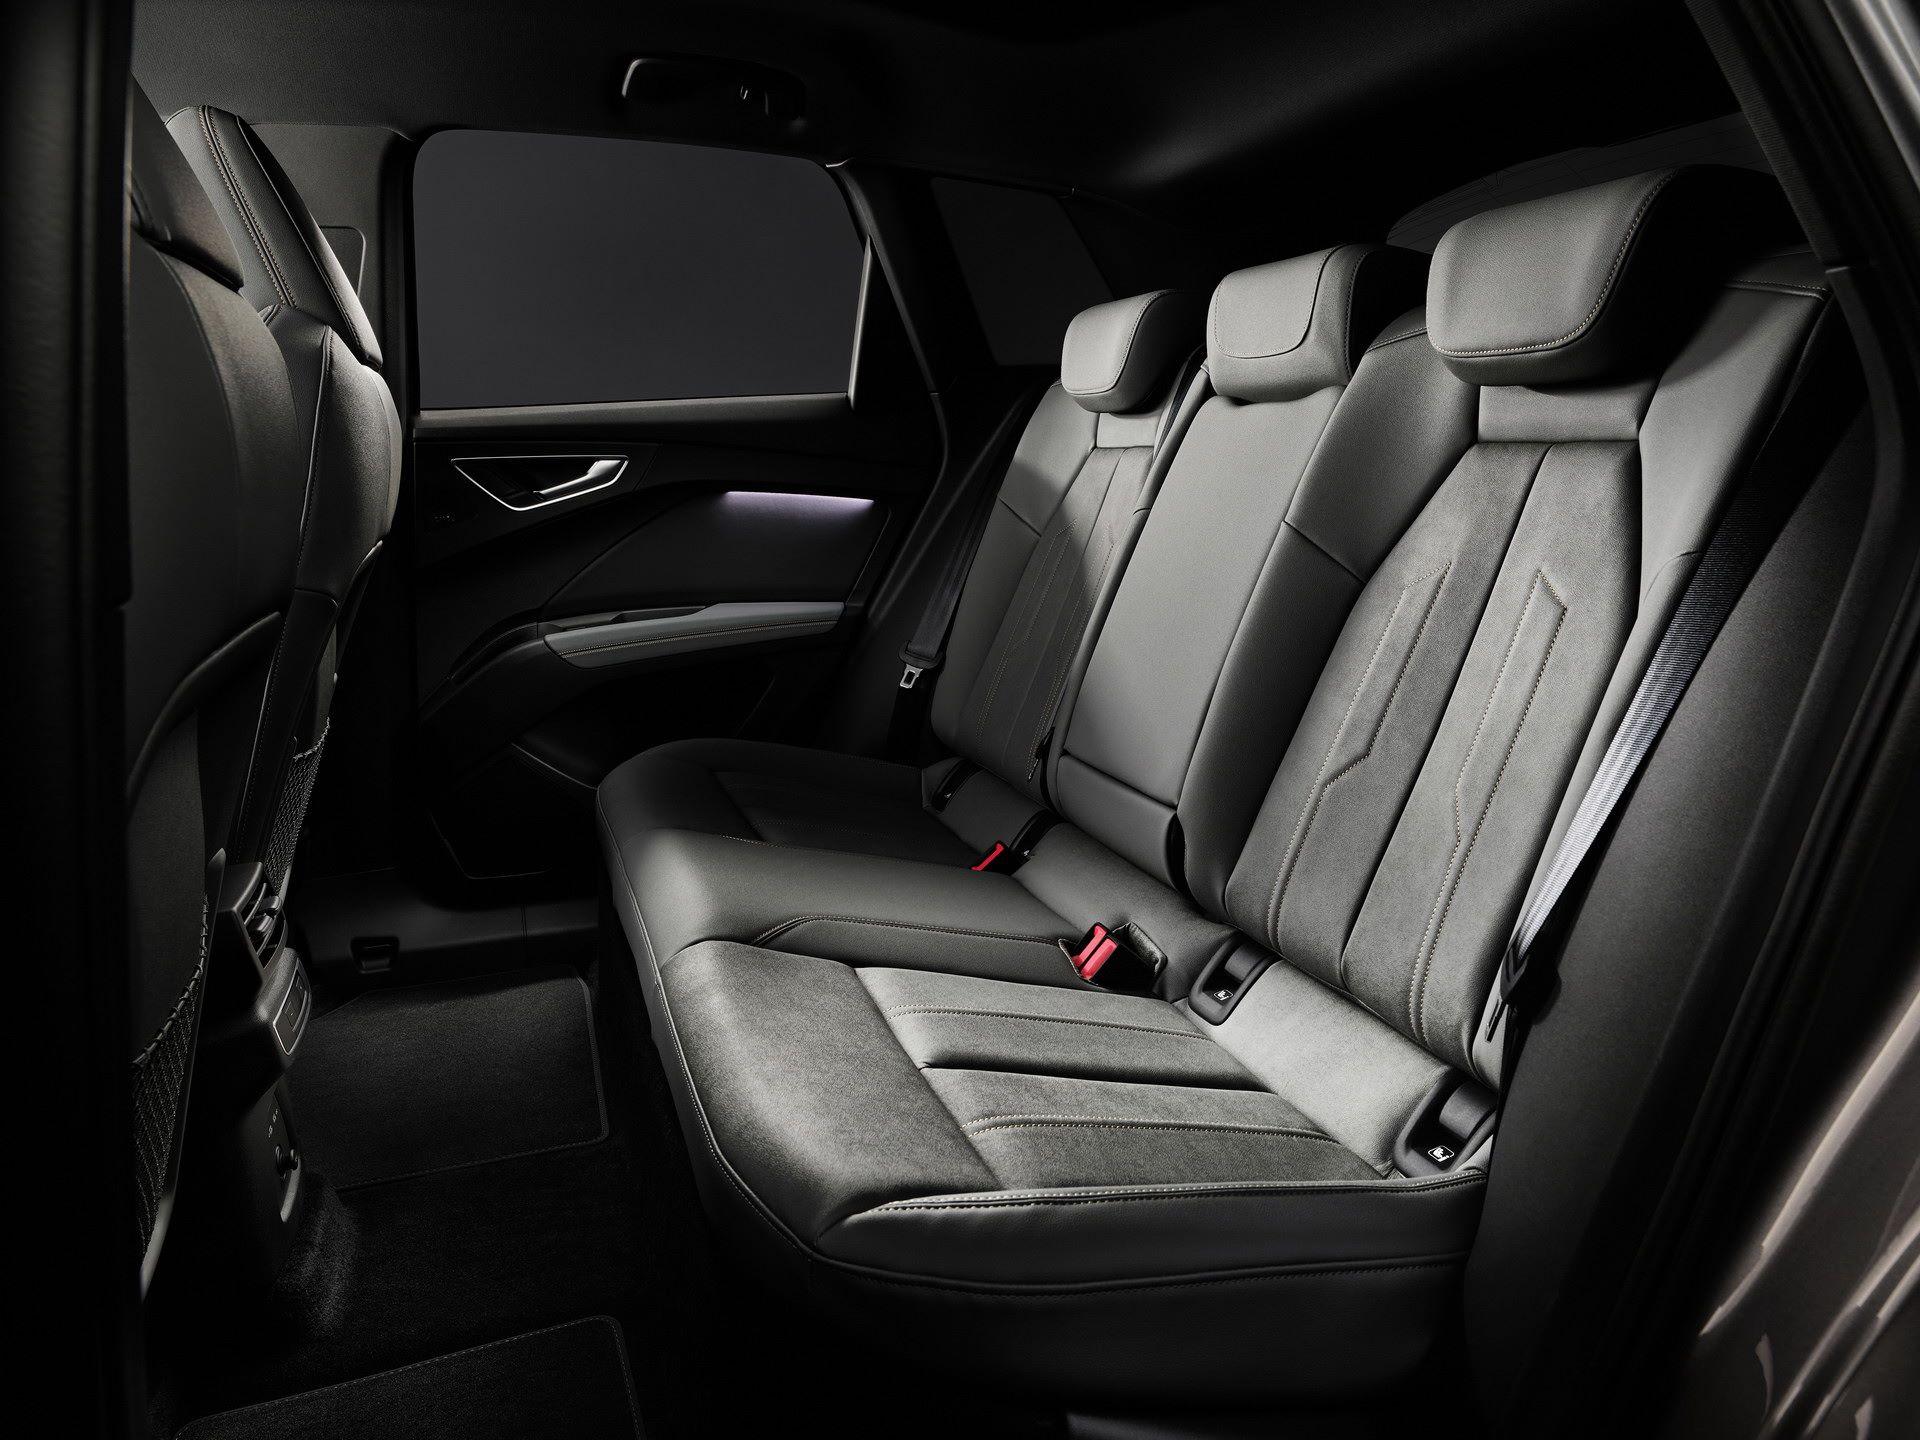 Audi-Q4-e-tron-and-Q4-e-tron-Sportback-62